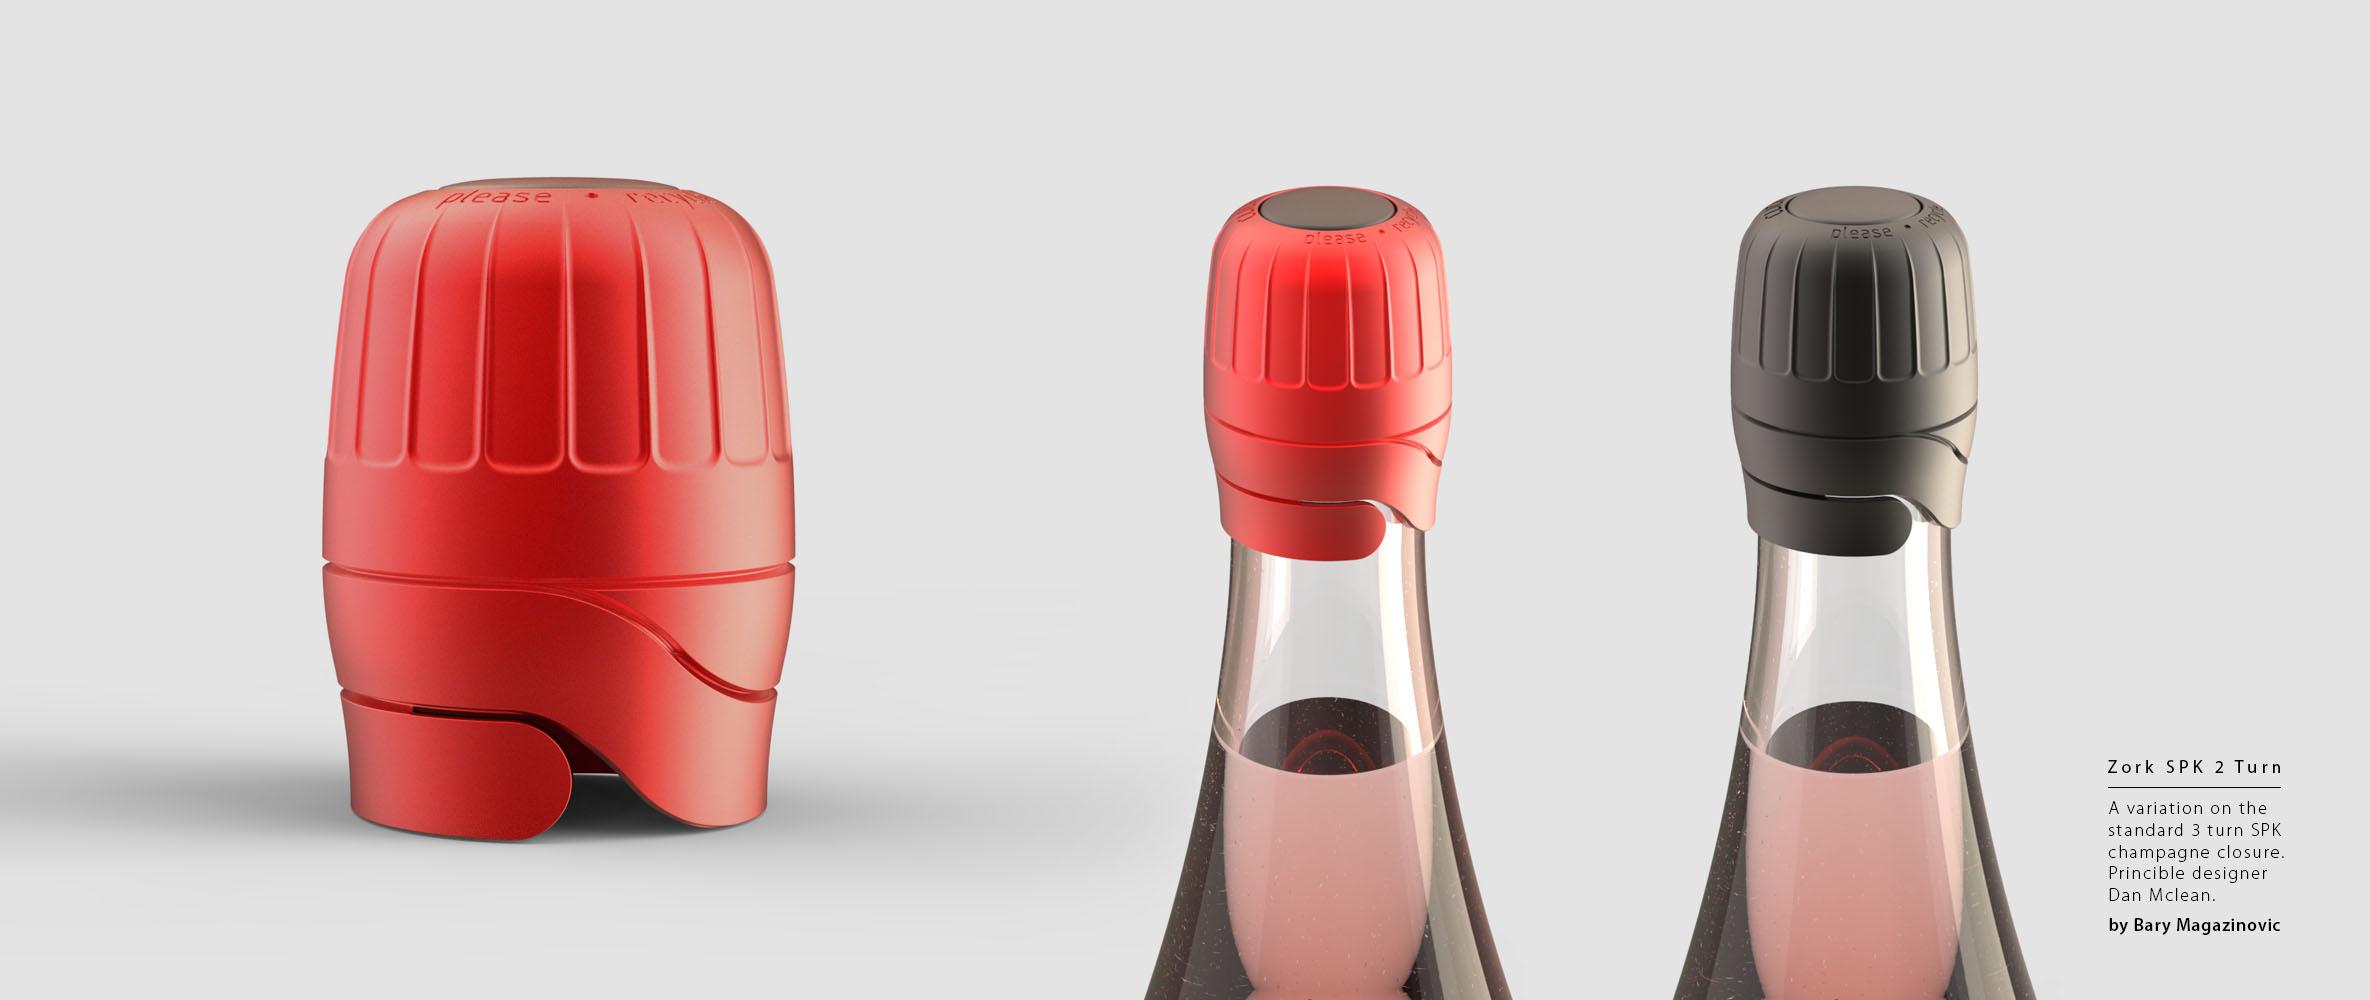 Australian Product Design Industrial Design Zork Wine closure 2 turn SPK sparkling champagne by Barry Magazinovic